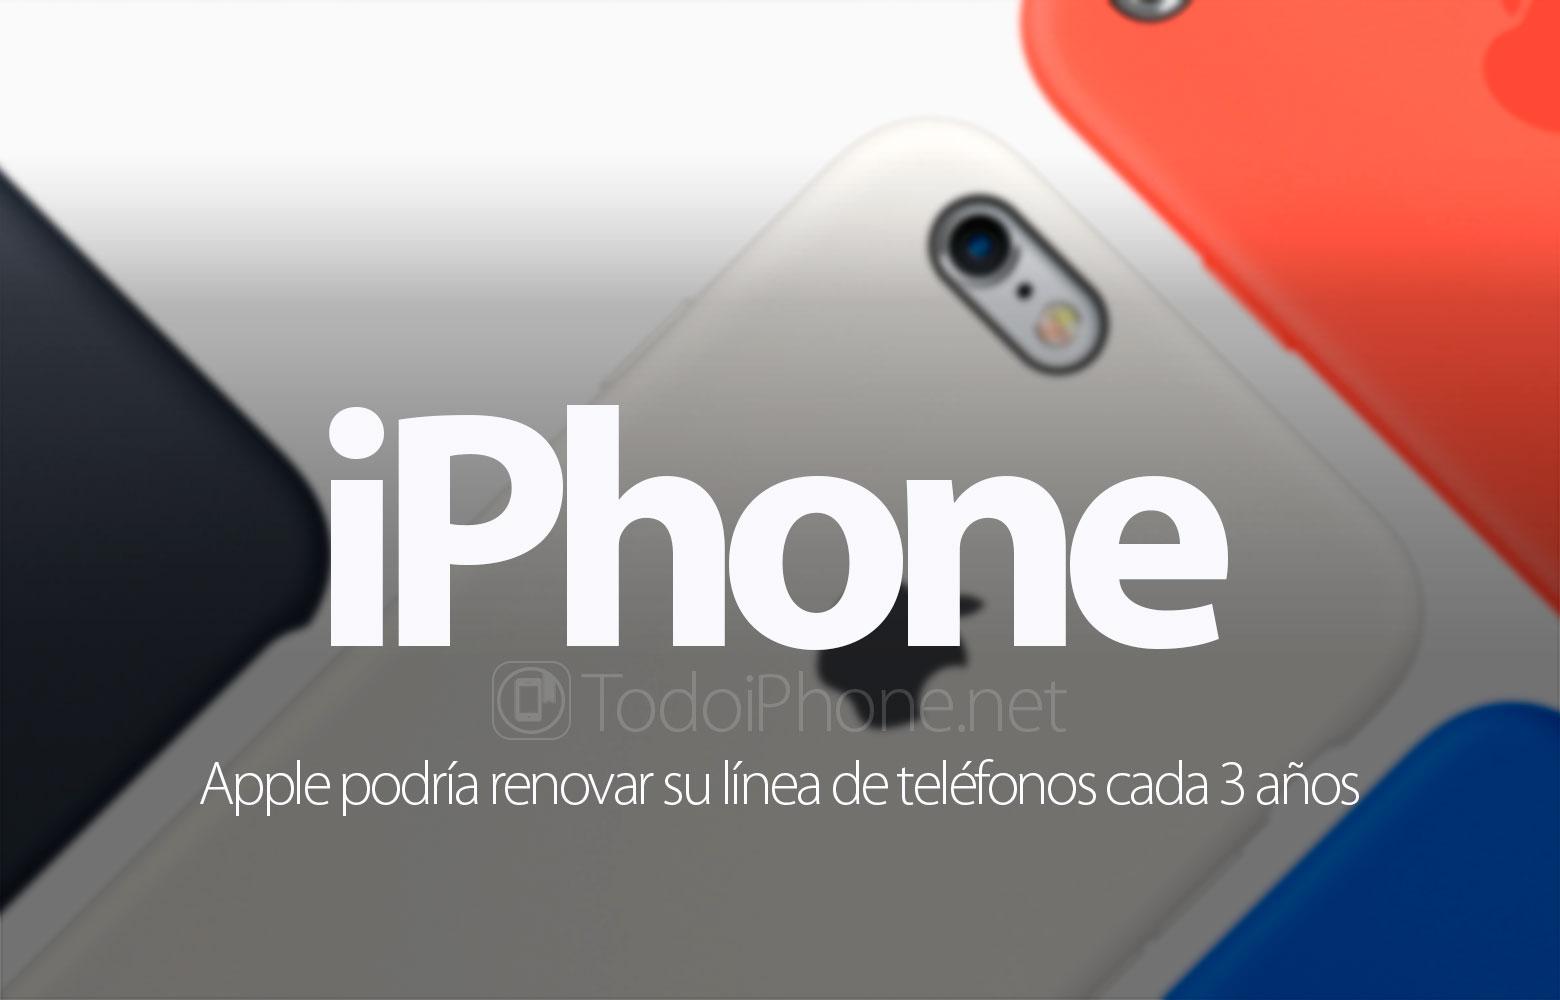 iphone-apple-renovar-linea-telefonos-3-anos